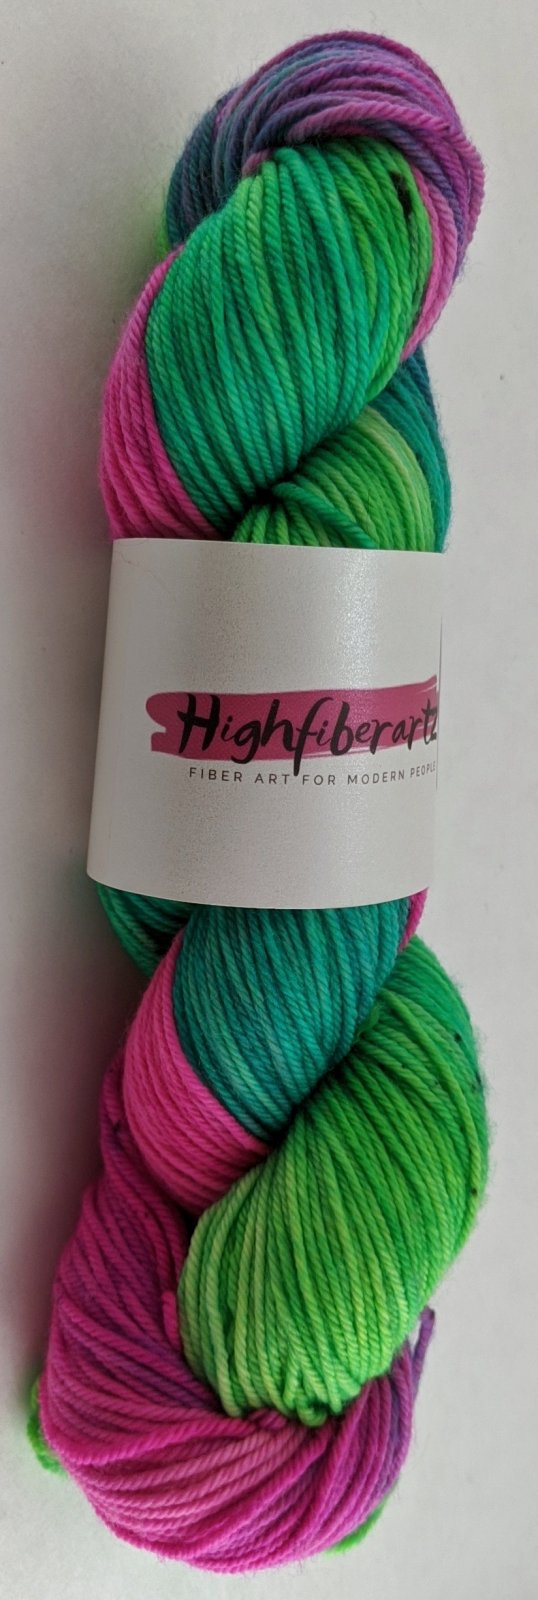 Highfiberartz DK Sock